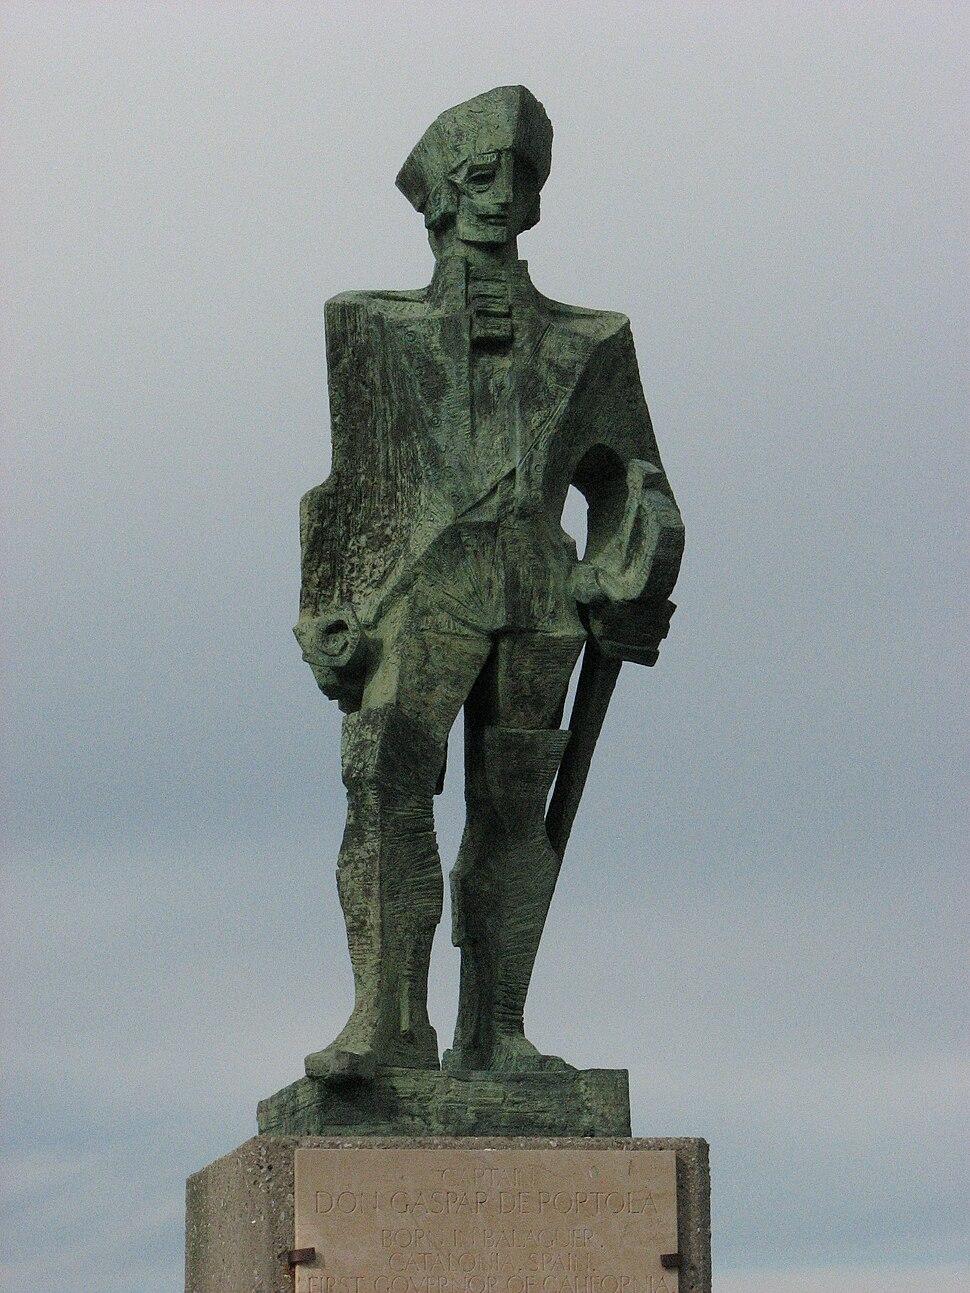 Gaspar de Portola statue